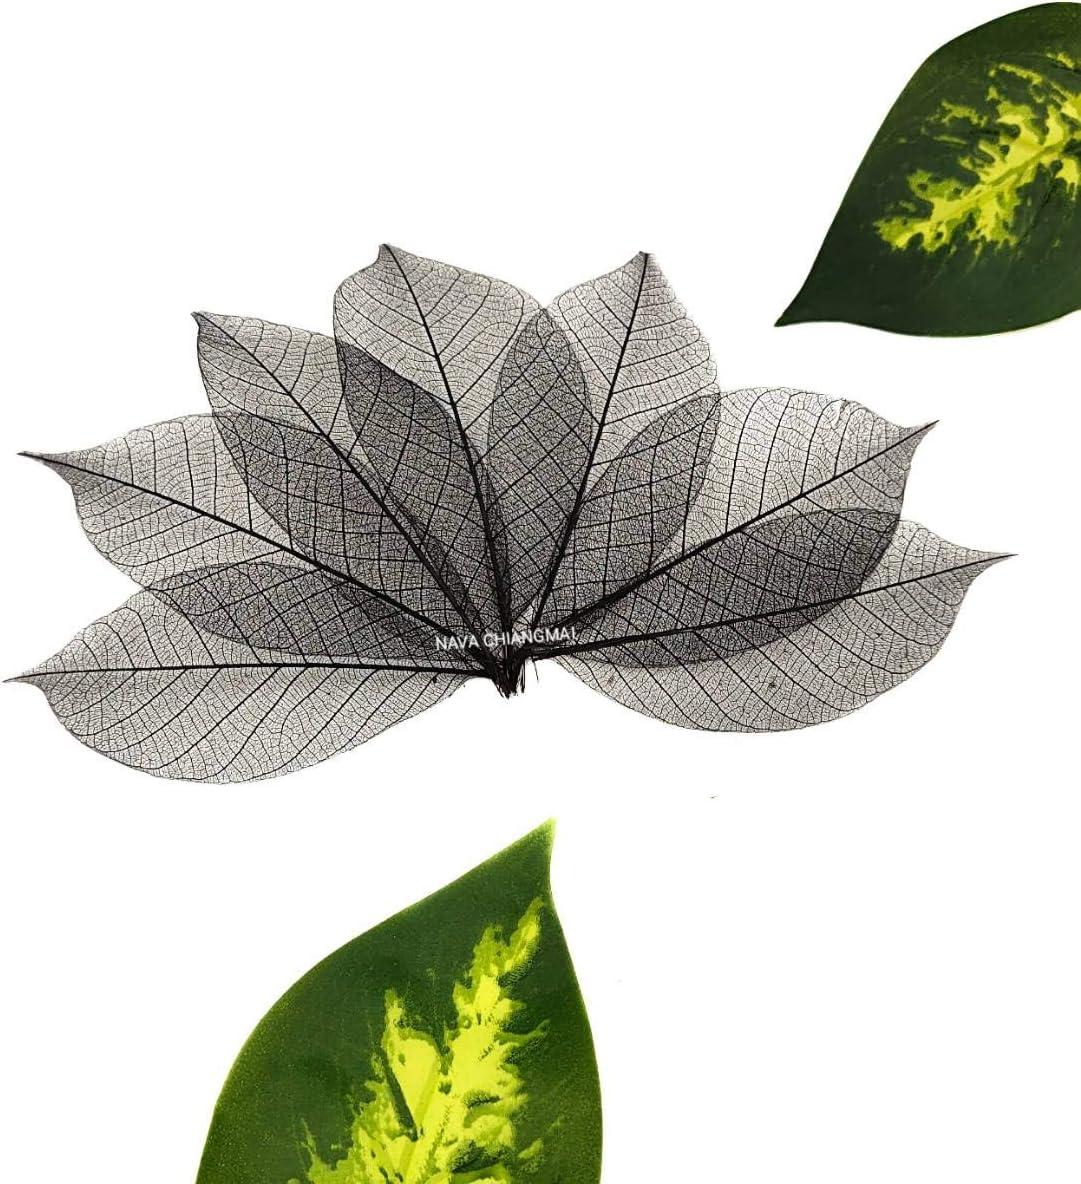 70% OFF Outlet NAVA CHIANGMAI Branded goods Rubber Tree Leaves Pack 100 of Skeleton -